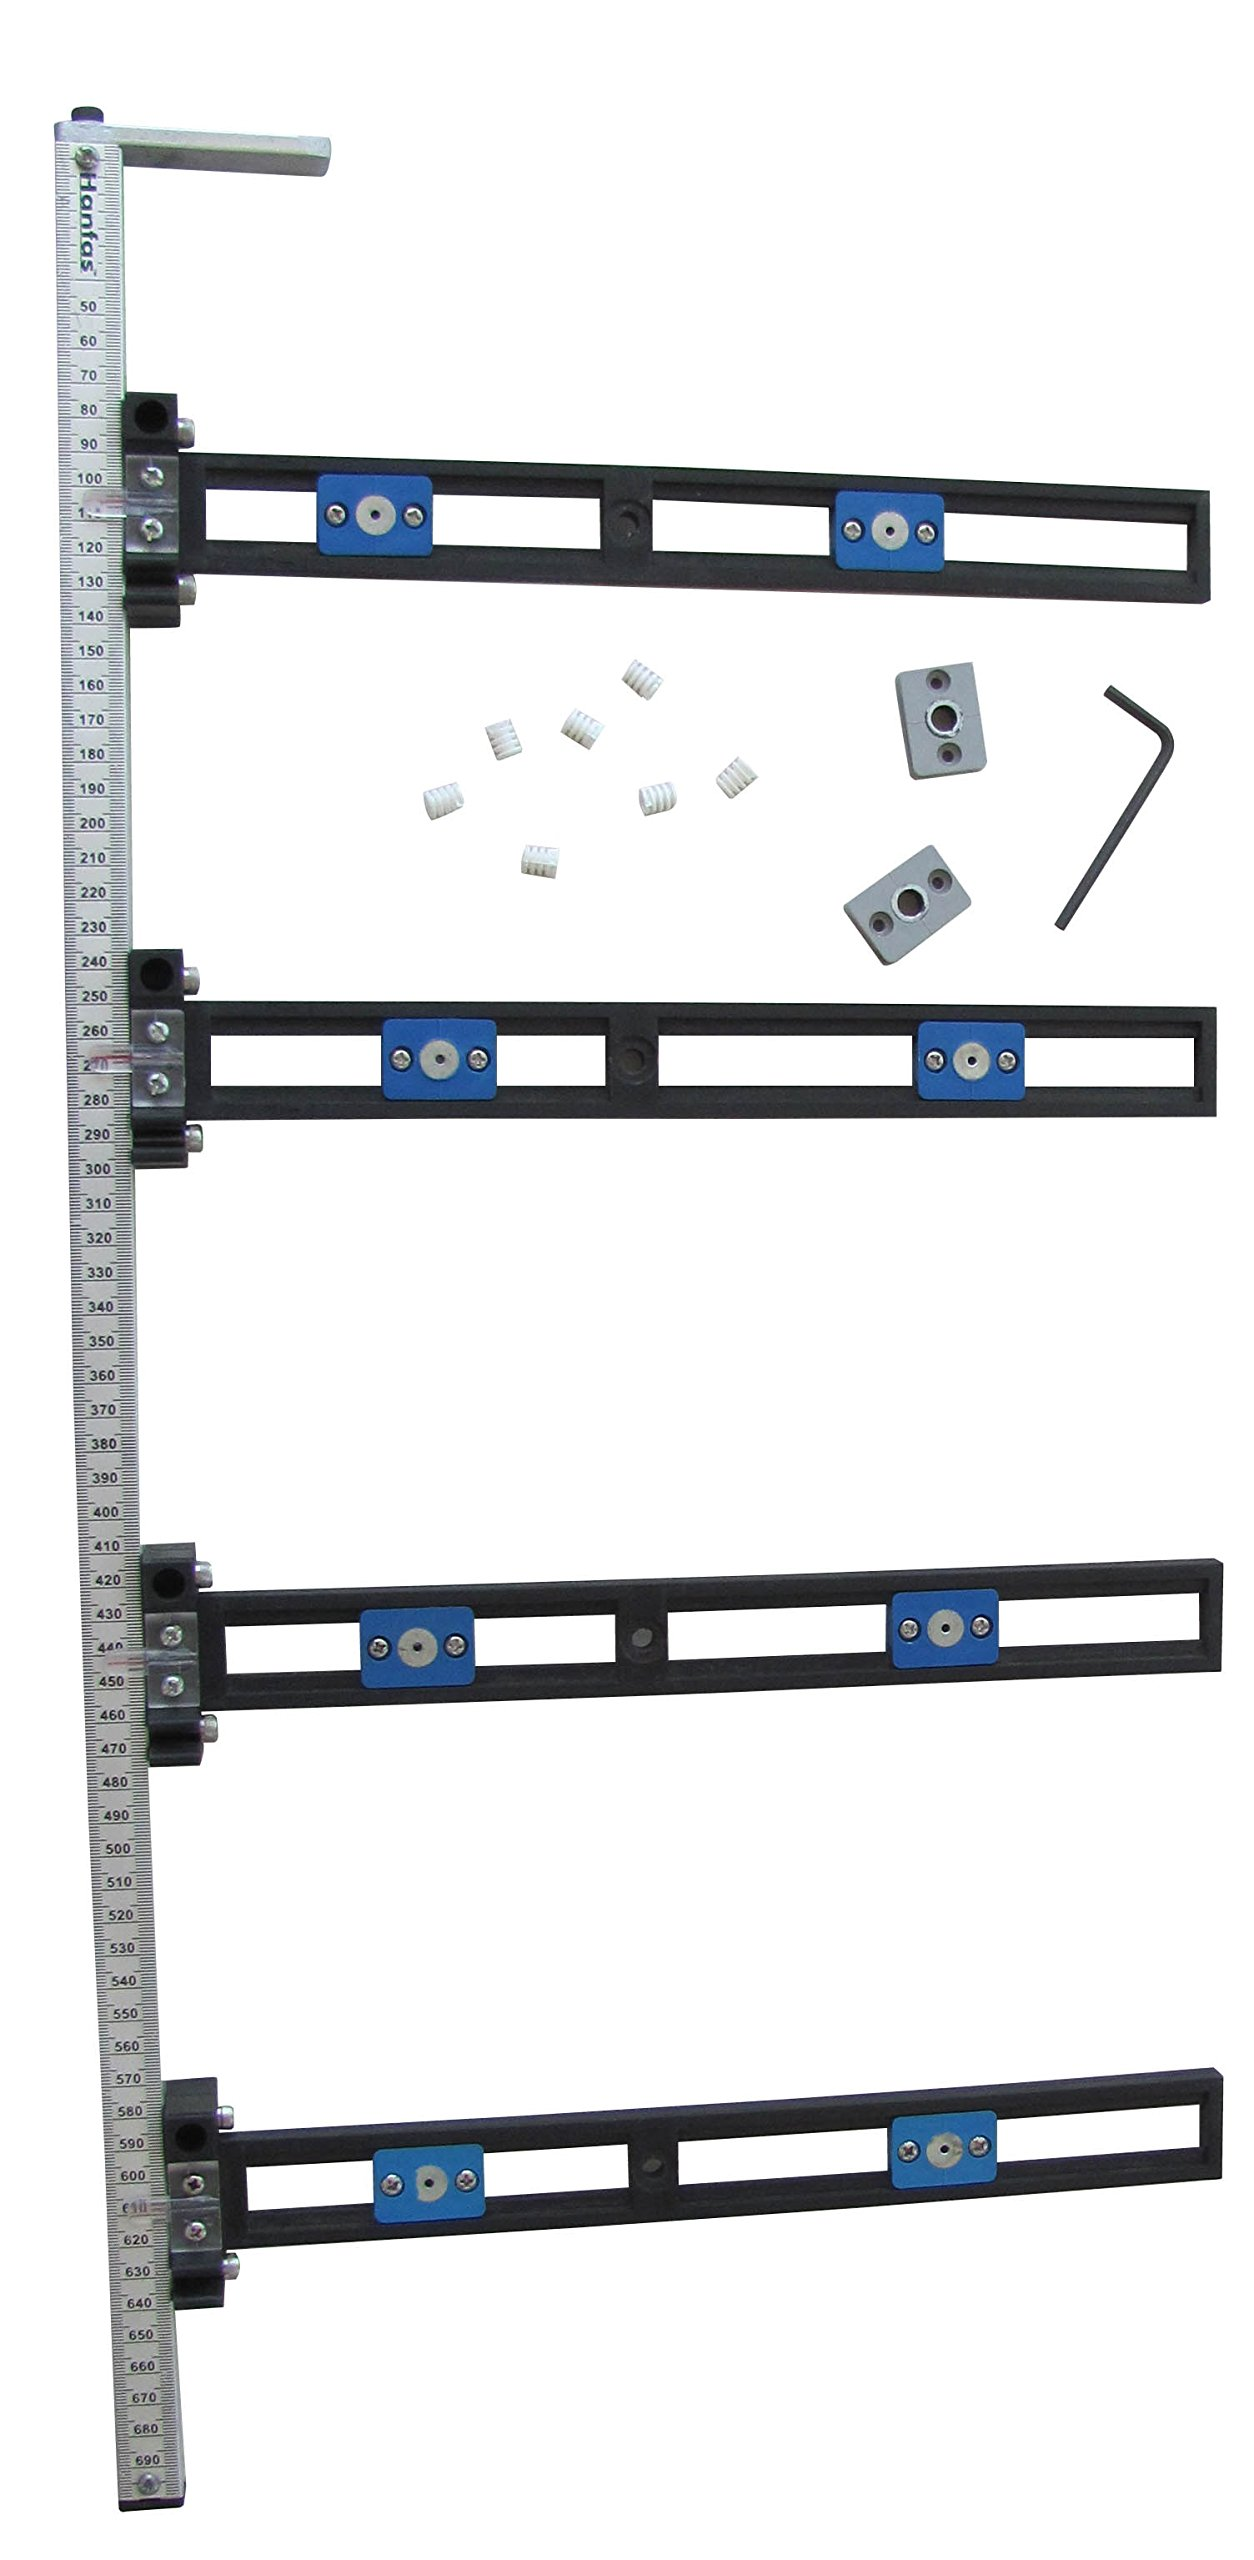 Hanfas H-620 Drawer Slide Jig- 4 Stations/Pre-Drilling Jig for Cabinet and Drawer Handles/Universal Hardware Drawer Template Jig